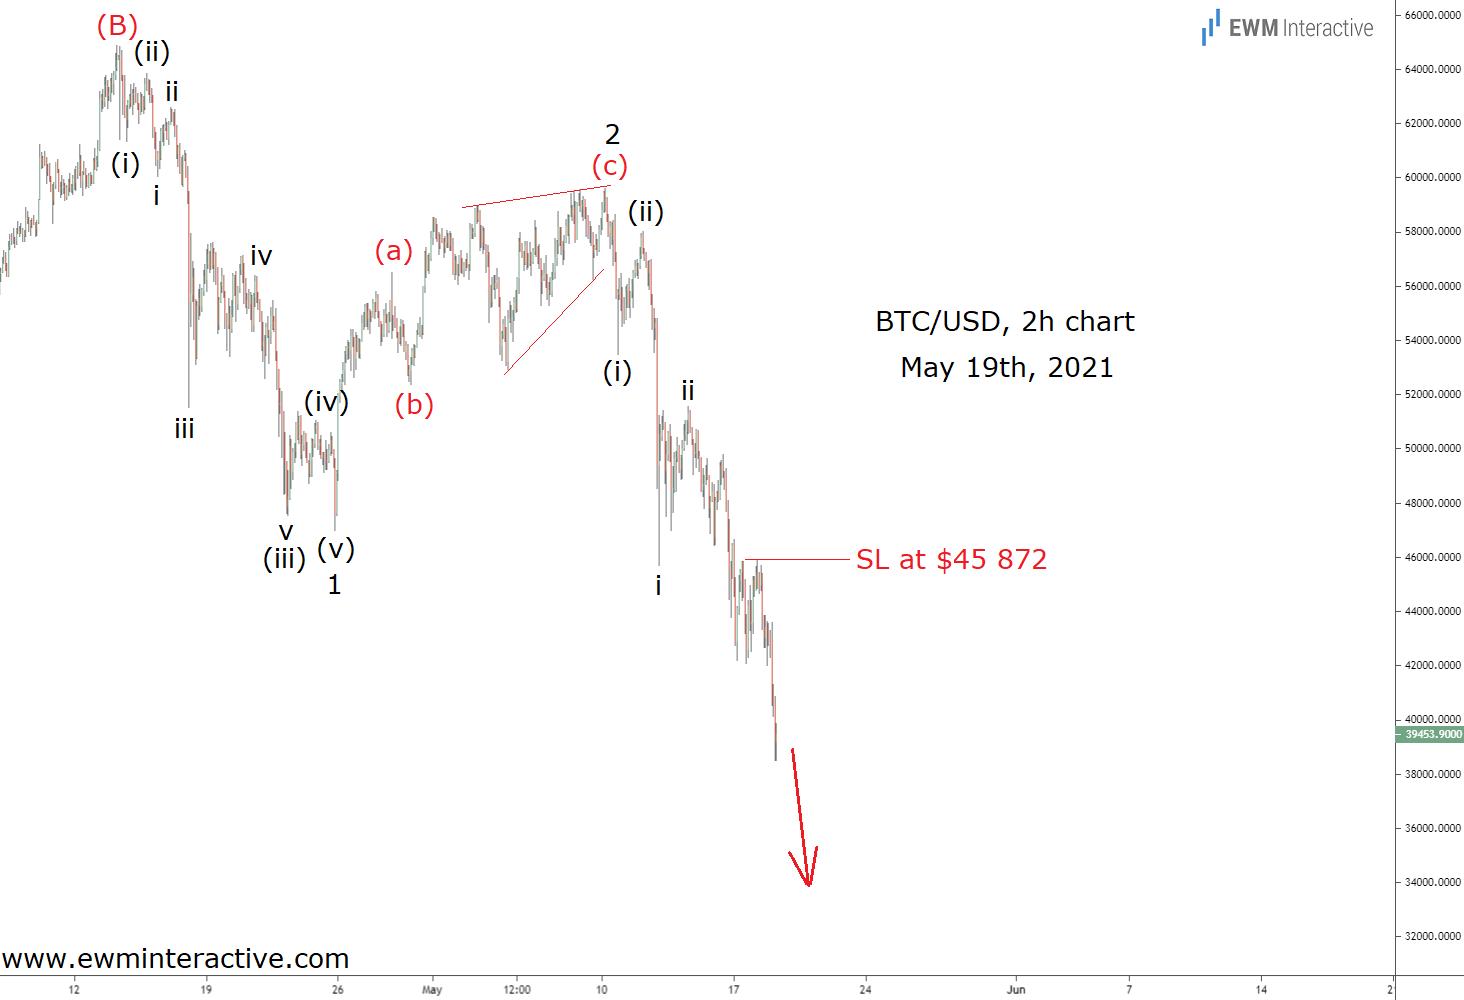 BTC/USD 2-Hr Chart - May 19th, 2021